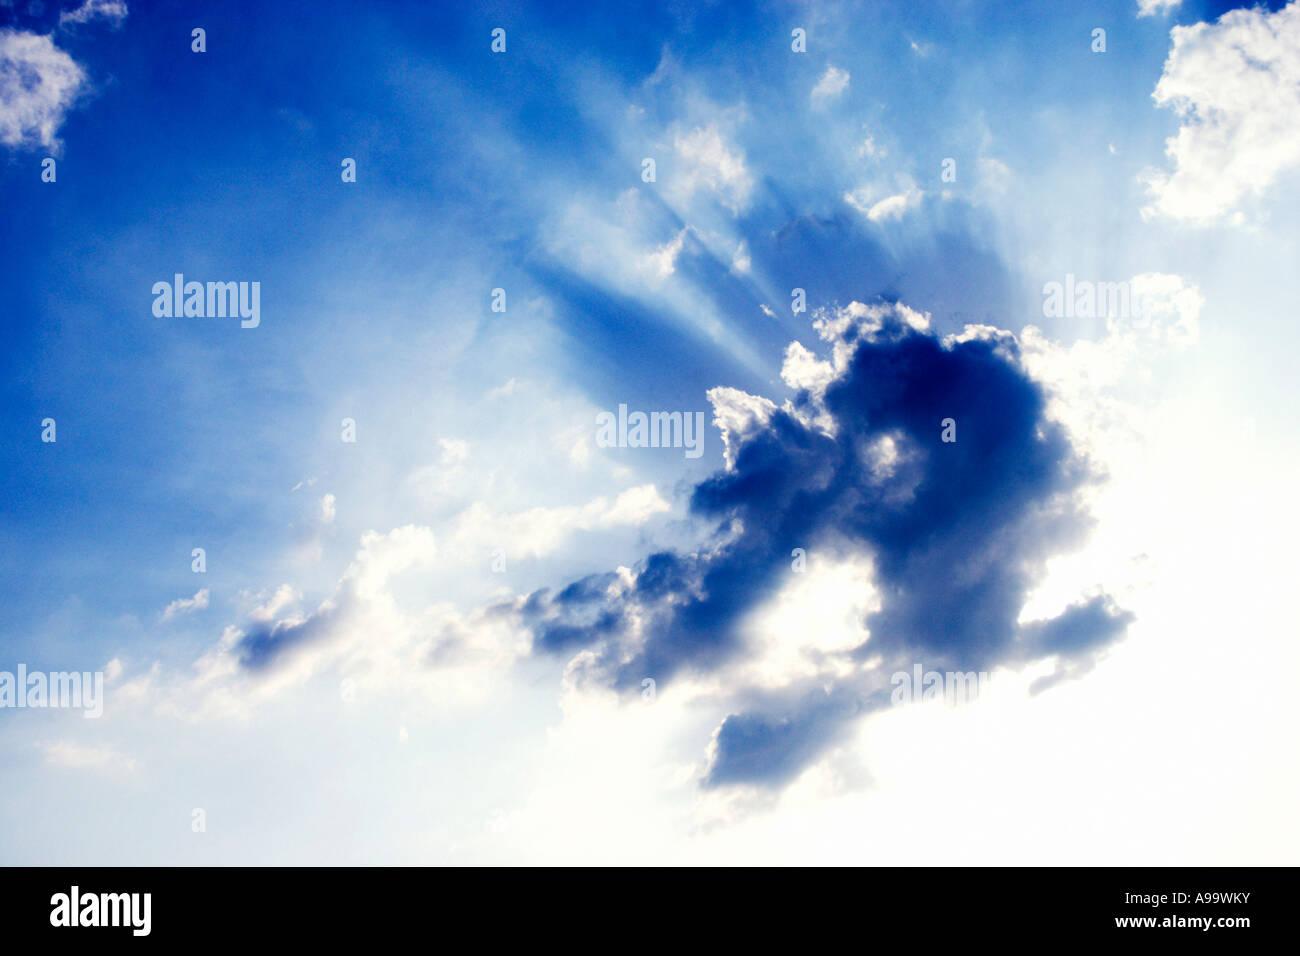 Sunburst through cloud-scape. - Stock Image